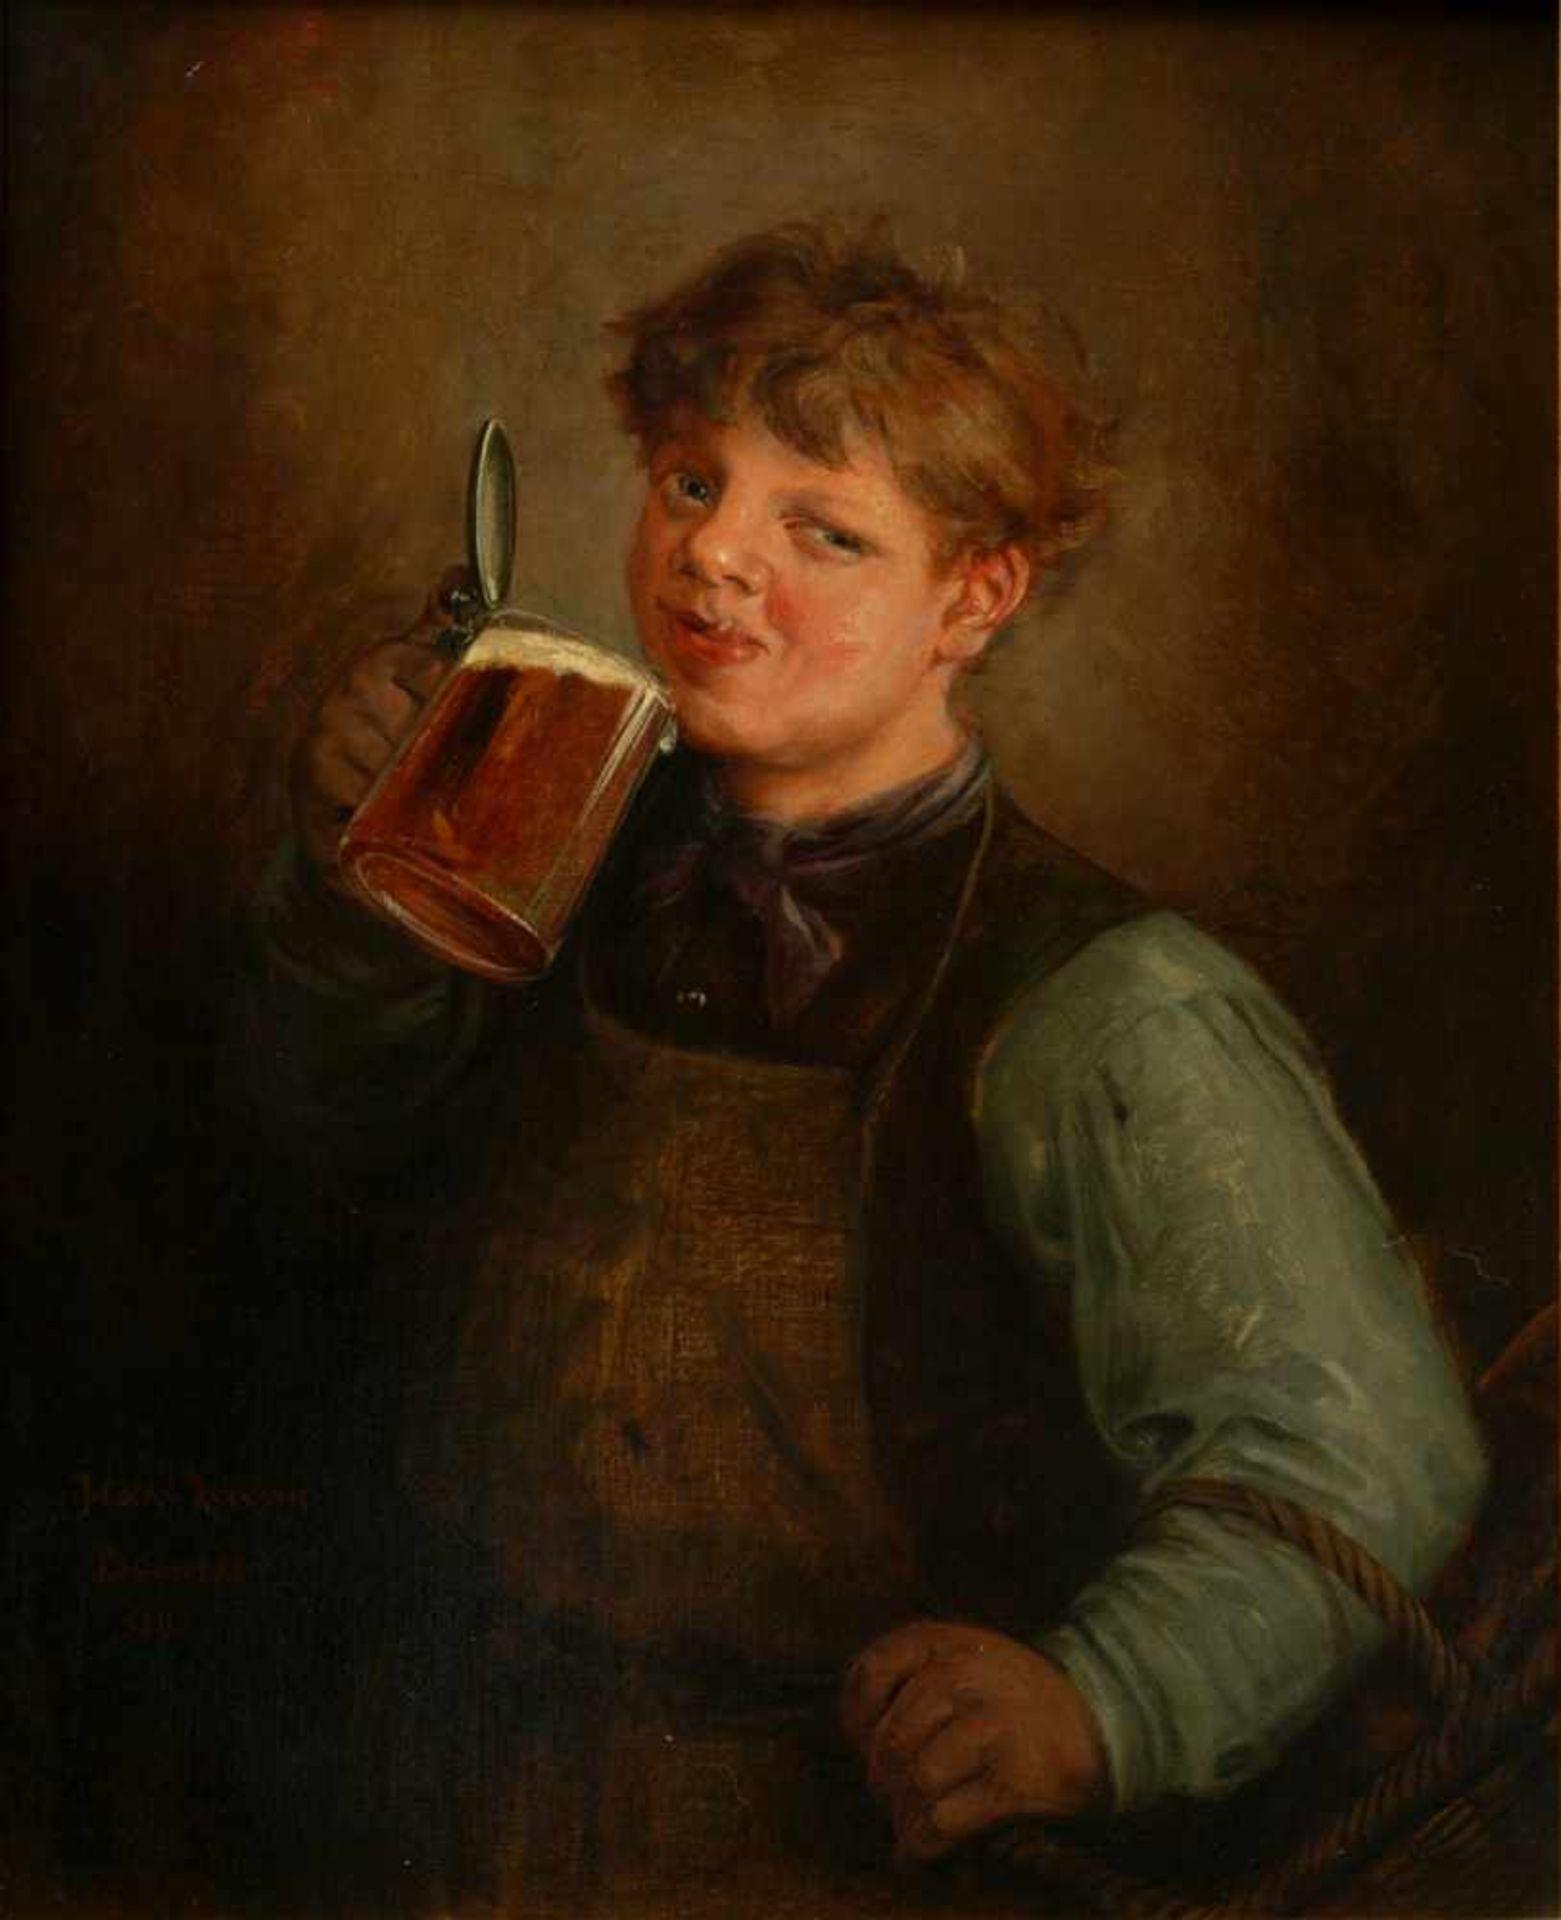 Lassen, Hans August (1857-1931) - Biertrinkender Jüngling Düsseldorf 1890Großformatiges Hüftstück, - Bild 2 aus 6